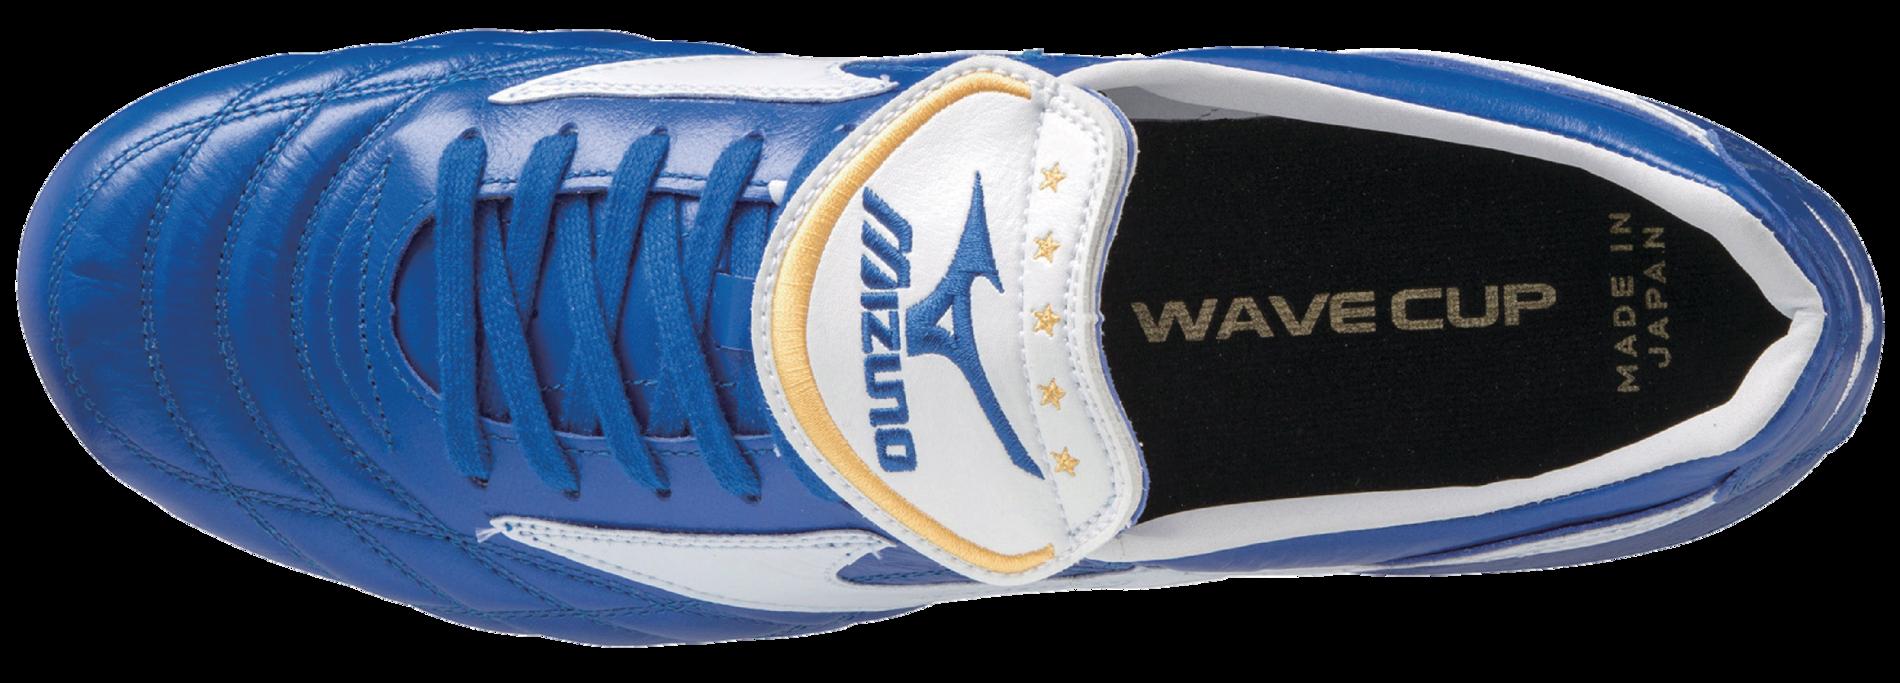 Mizuno Wave Cup Legend JAPAN Football Boots P1GA201901 Soccer Cleats Shoes